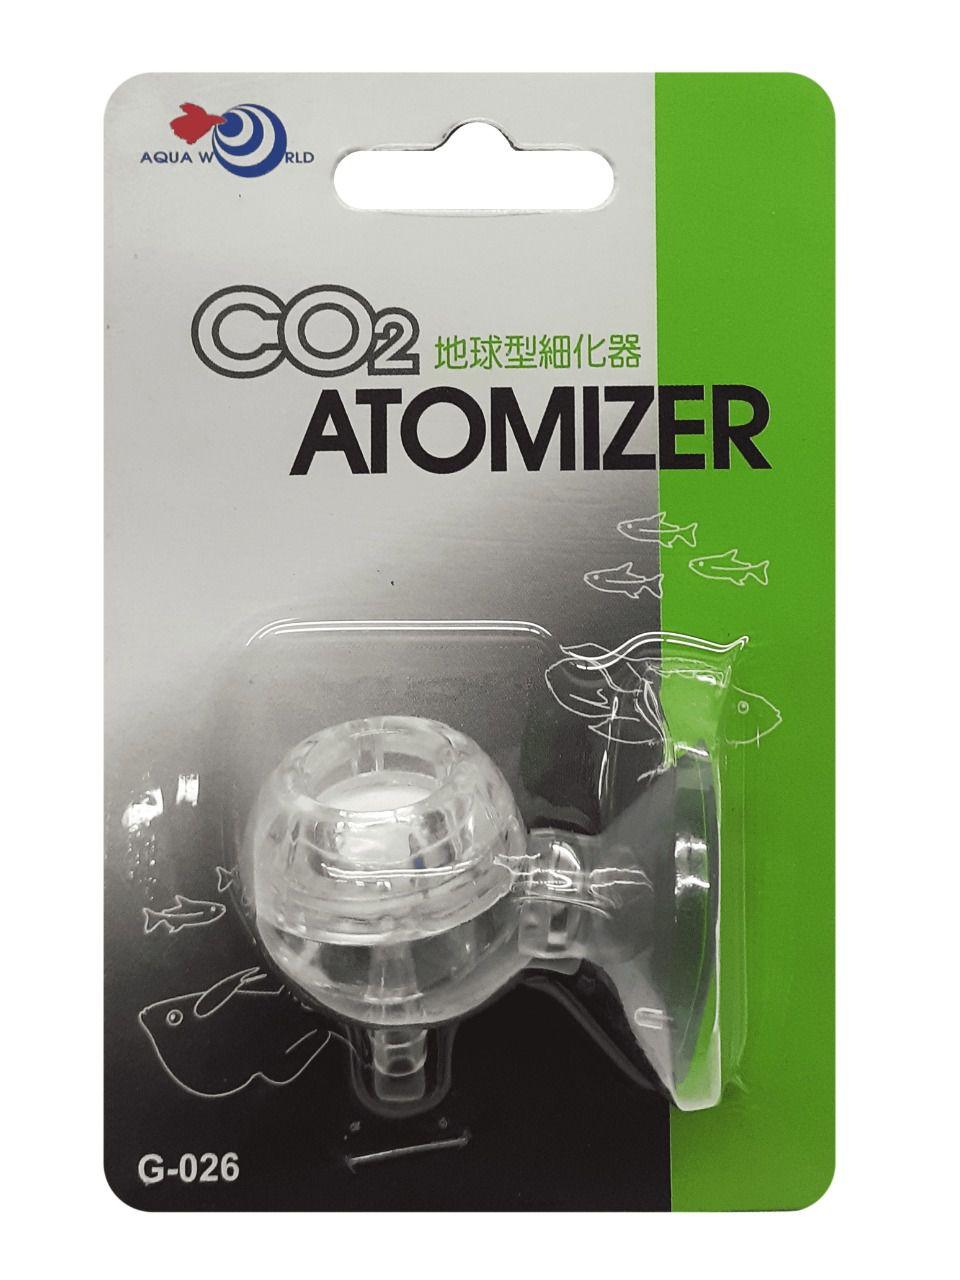 UP DIFUSOR CO2 AUTOMIZER CRISTAL G-026